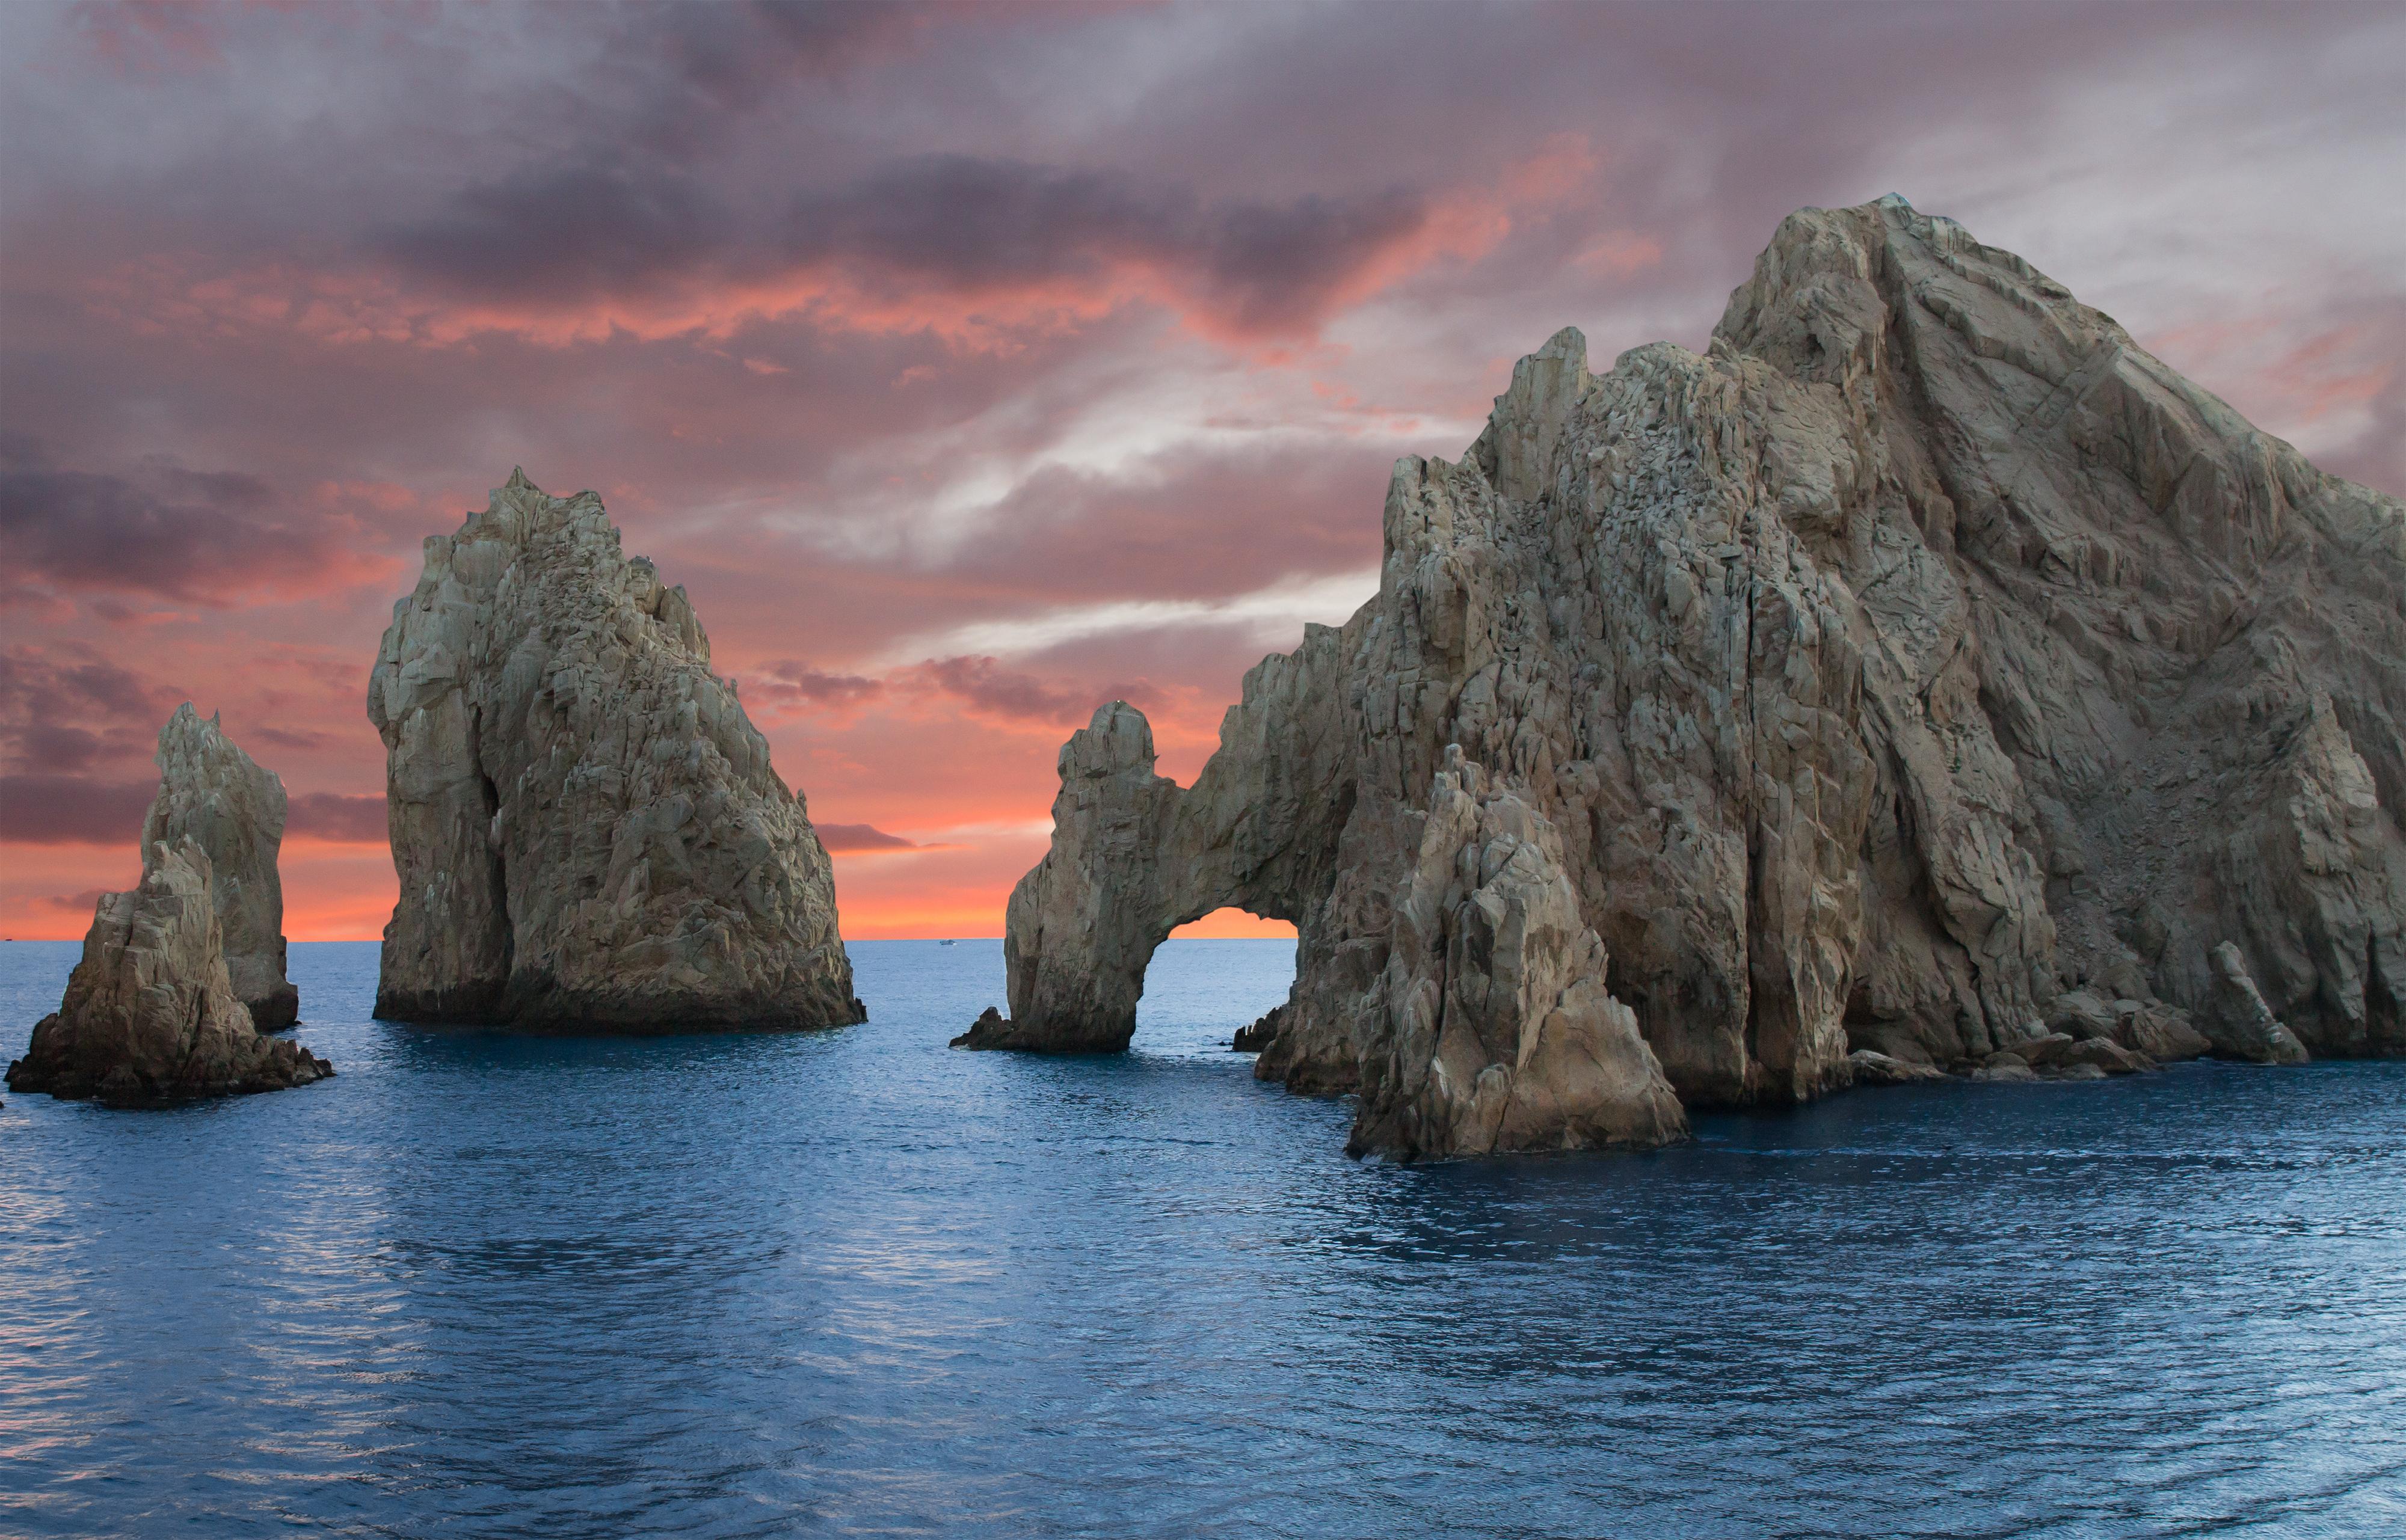 The Rock Formation of Land's End, Baja California Sur, Mexico, near Cabo San Lucas